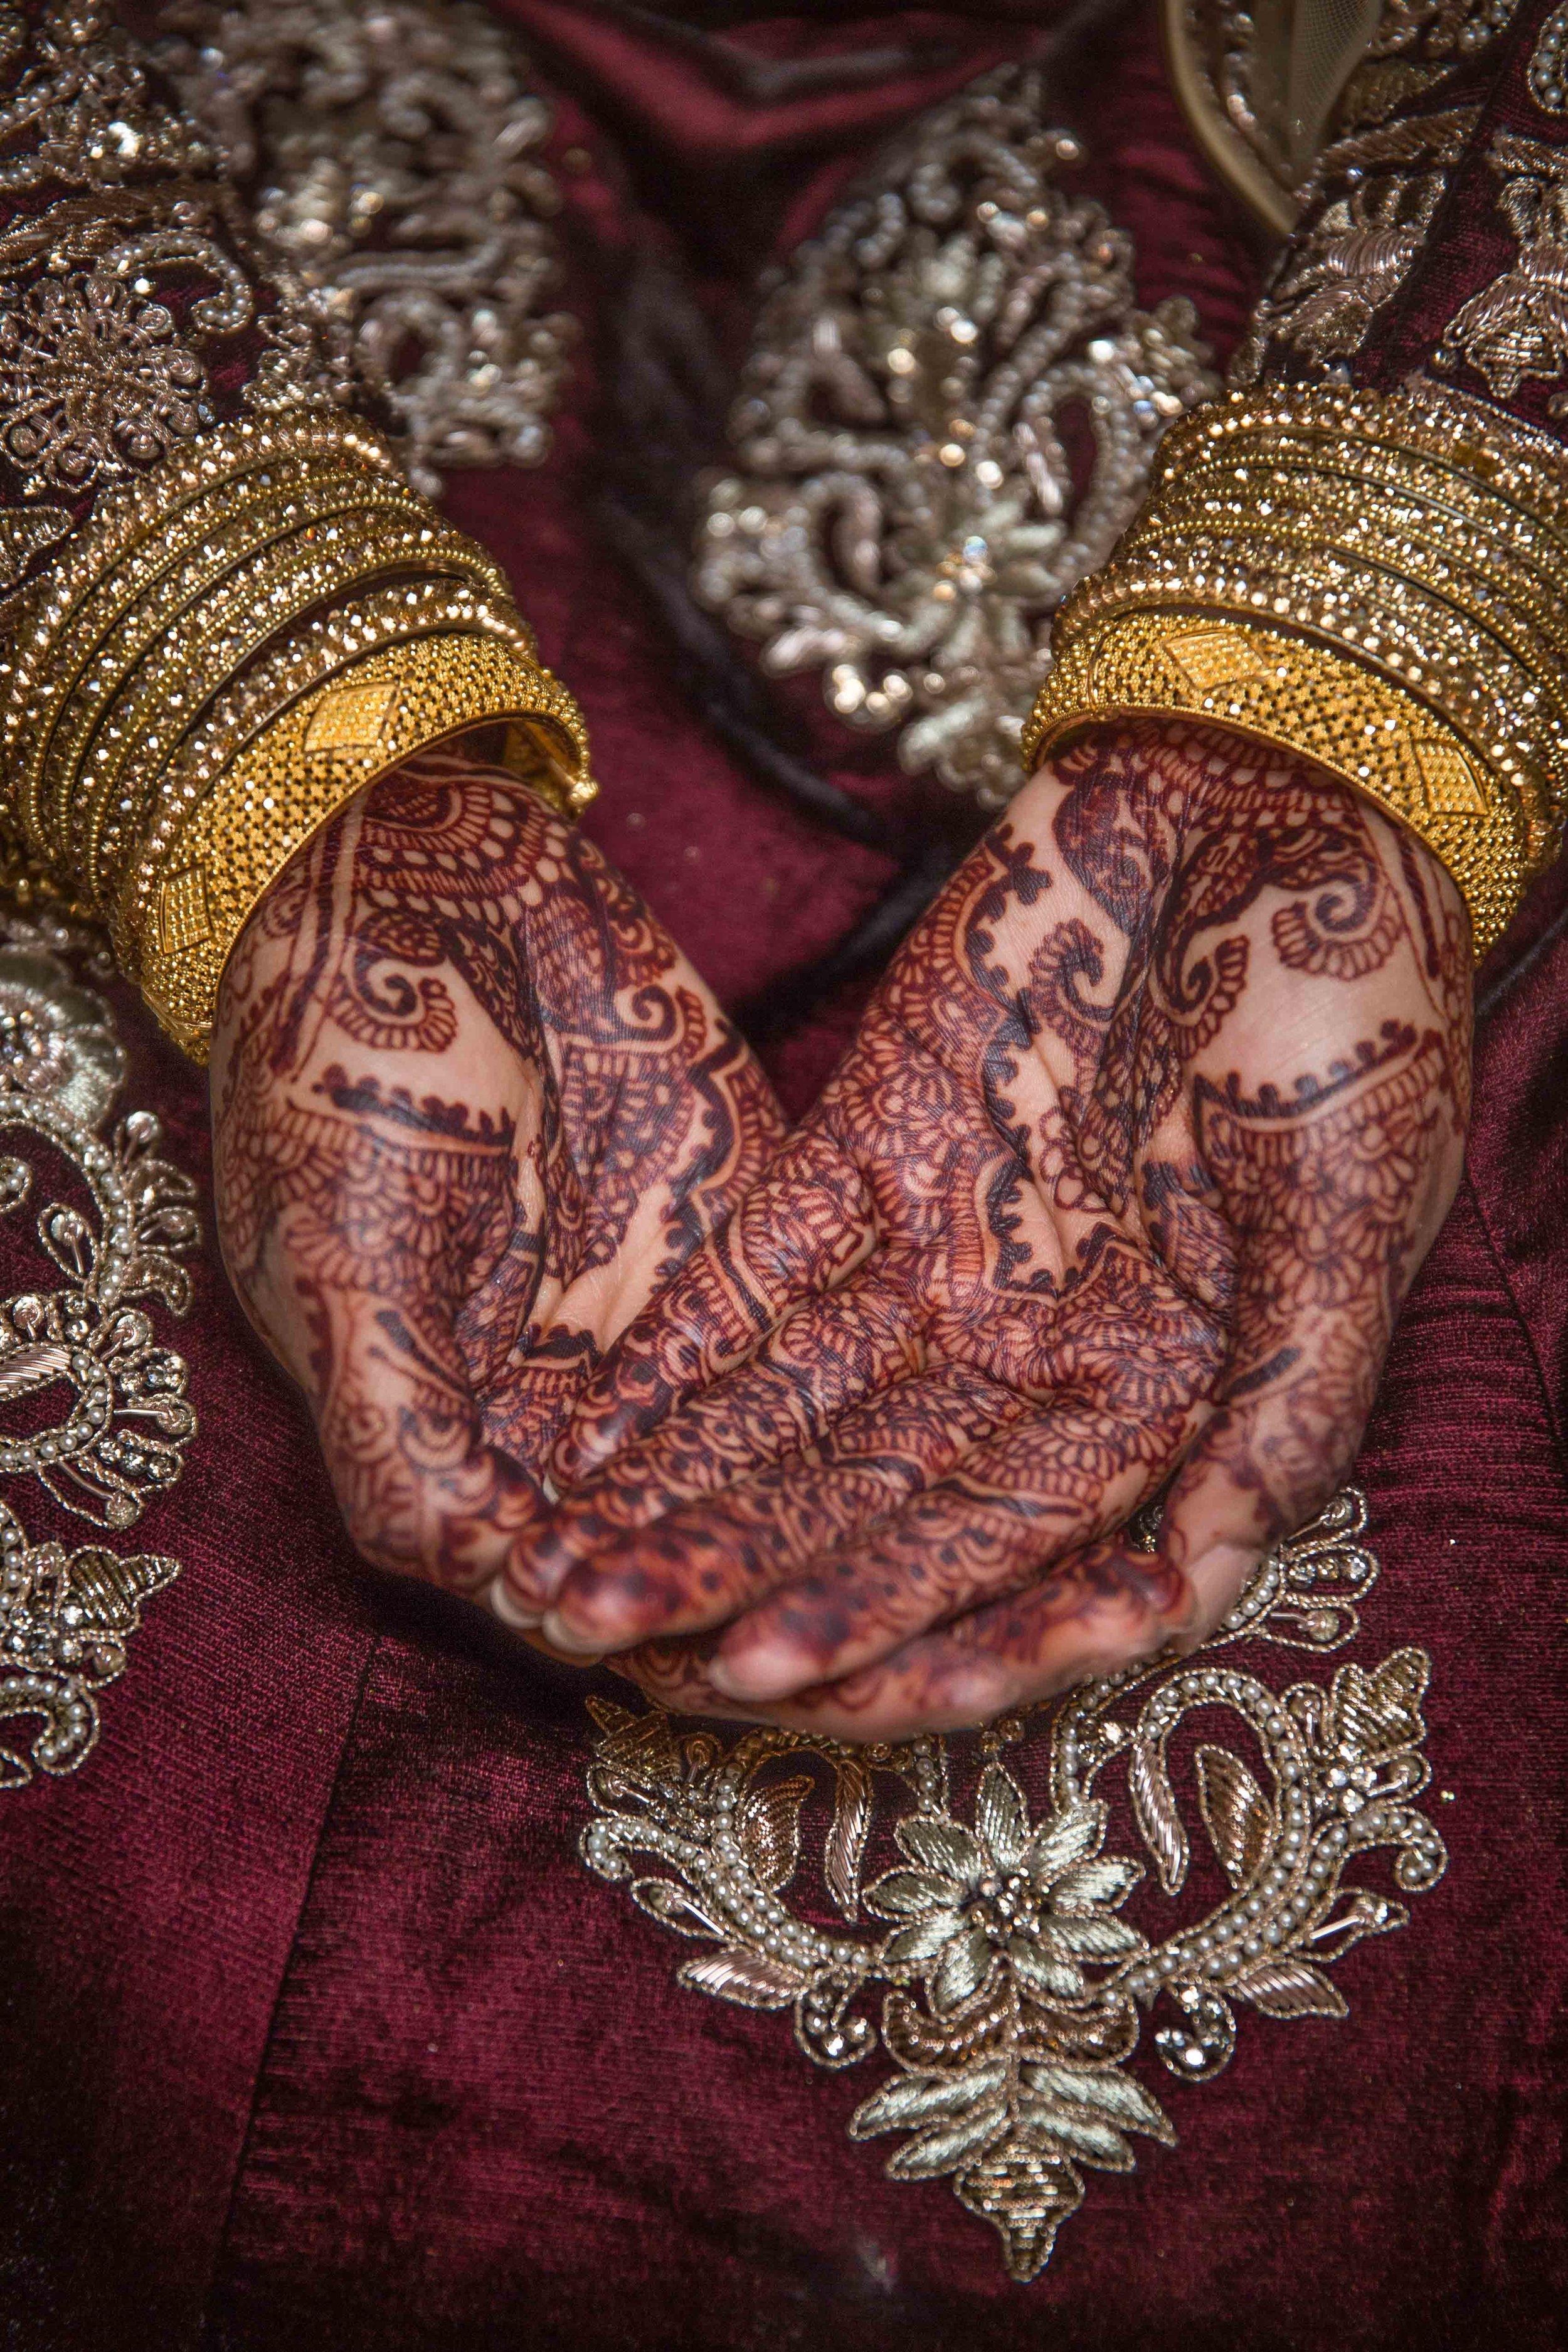 Female-Asian-Piccadilly-banqueting-suite-Wedding-Photographer-Birmingham-natalia-smith-photography-6.jpg